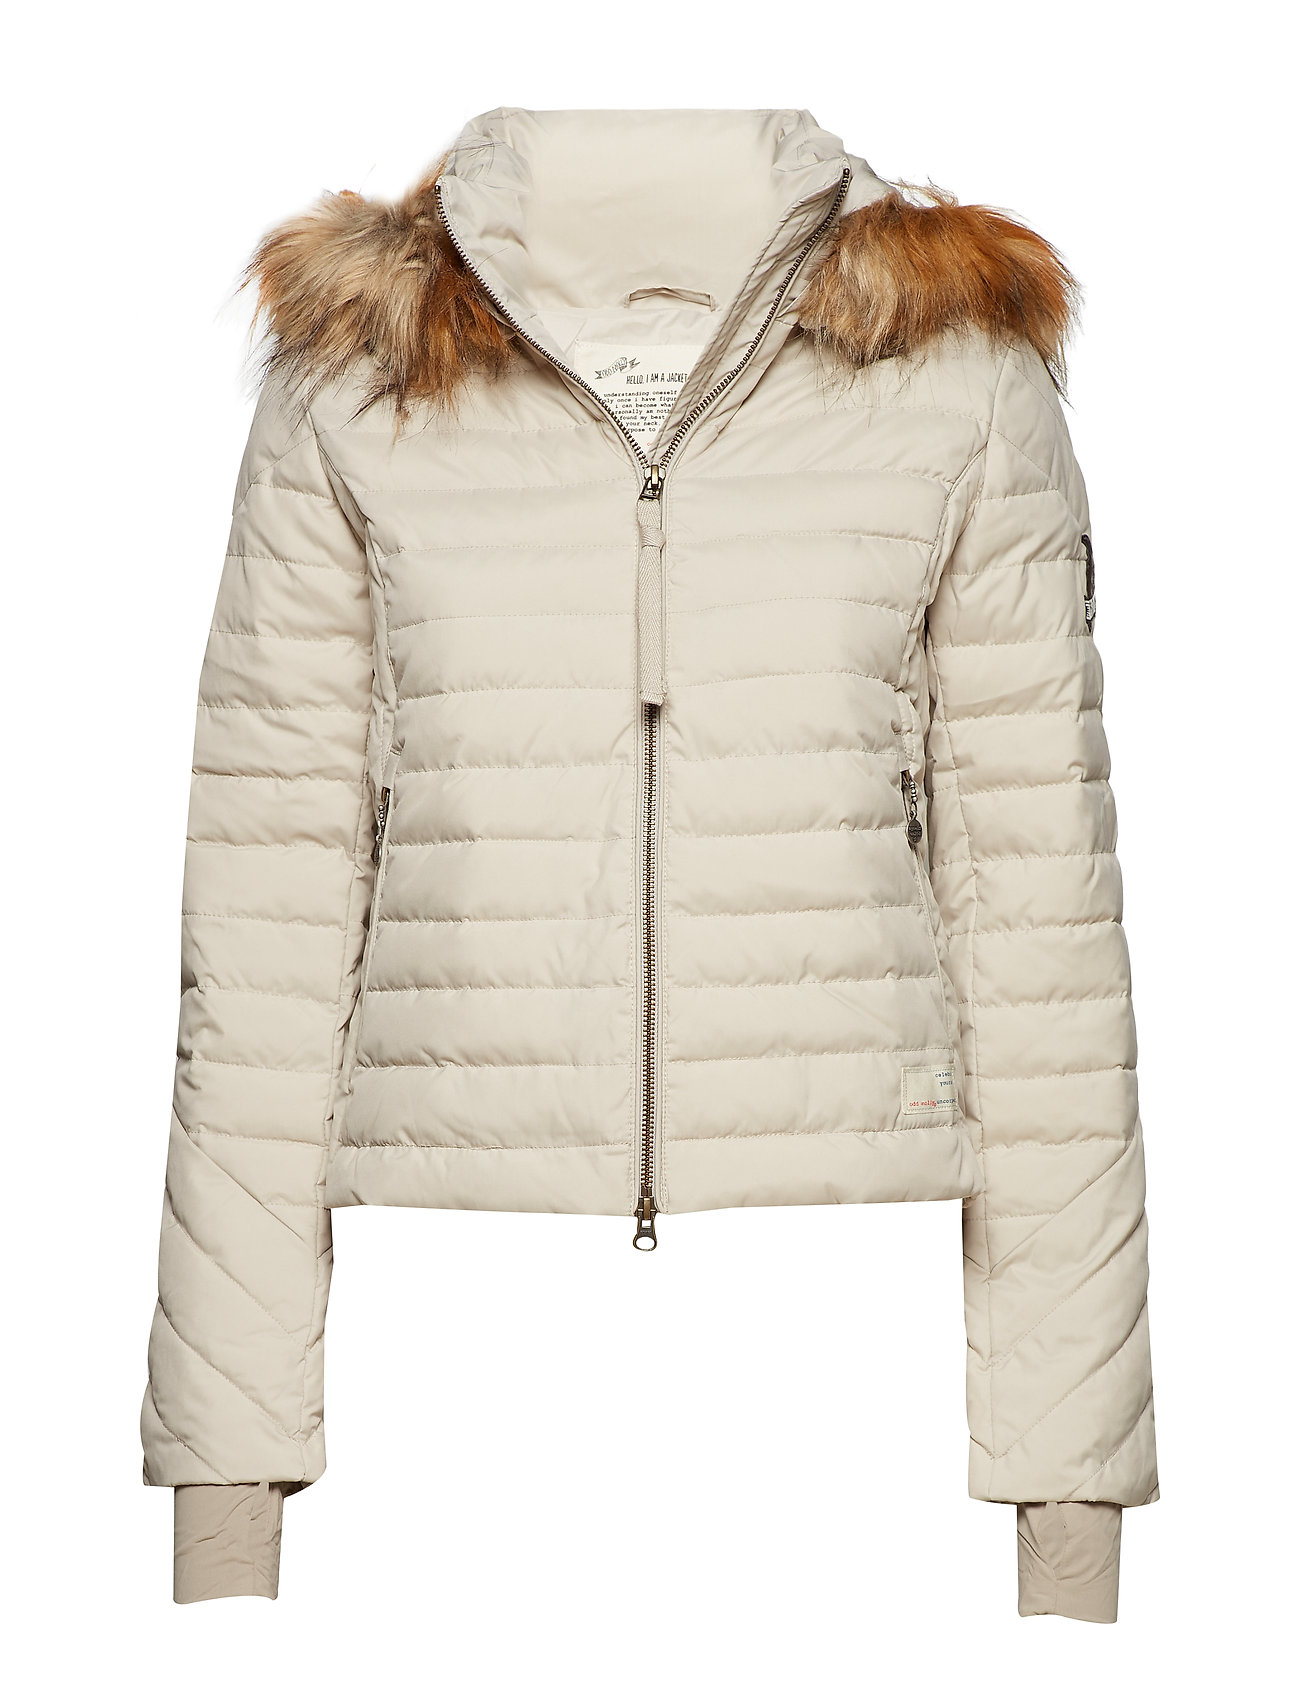 ODD MOLLY ACTIVE WEAR earth saver jacket